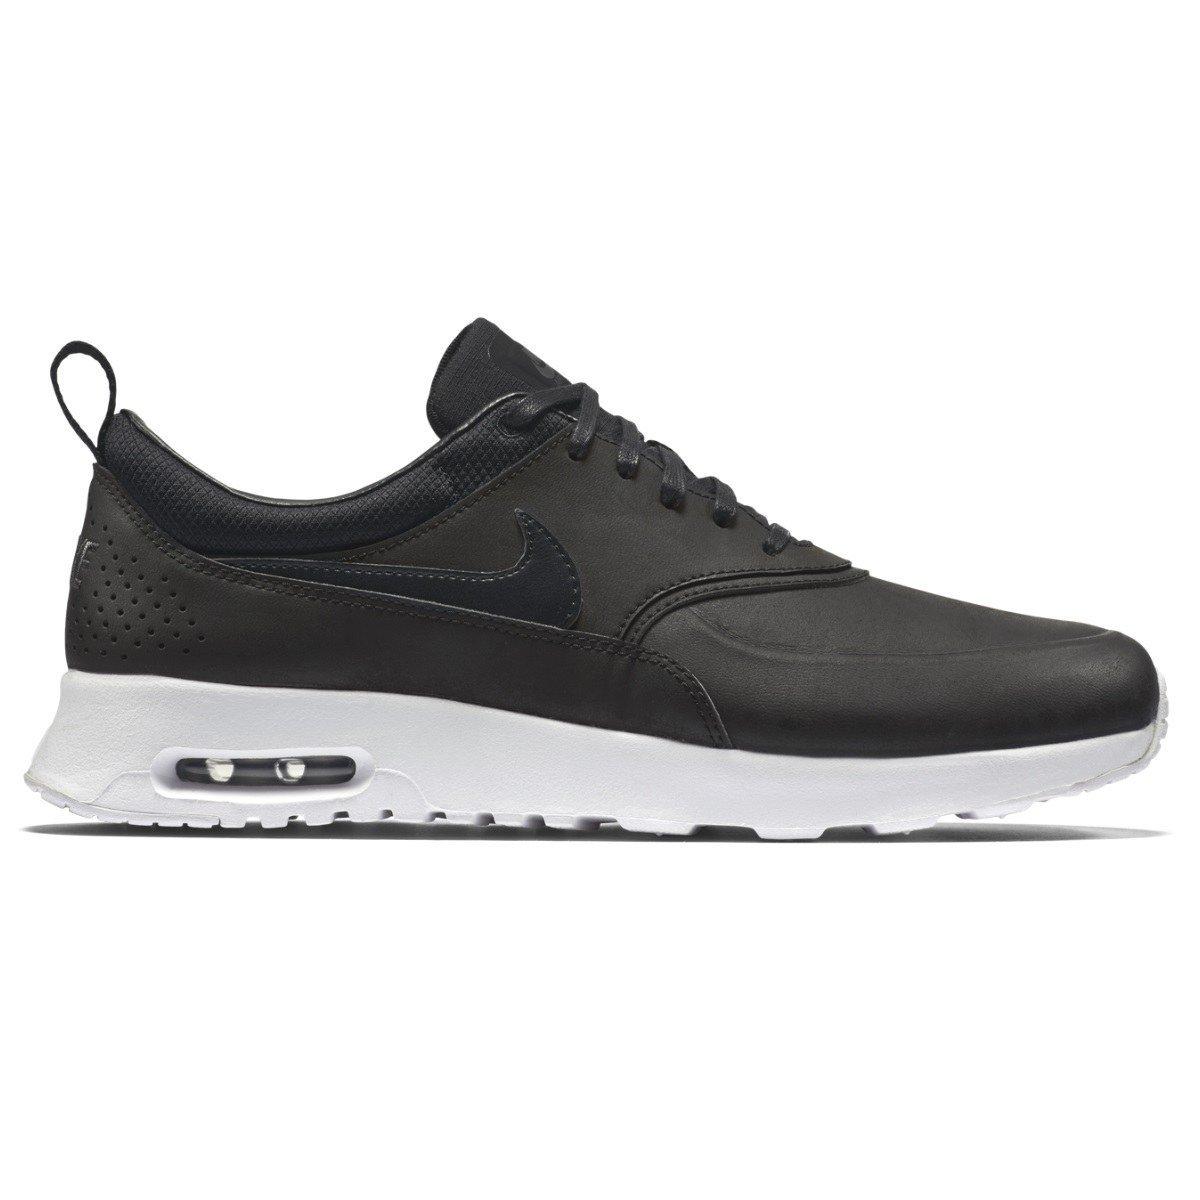 Nike WMNS Air Max Thea PRM Black Anthracite 616723 007